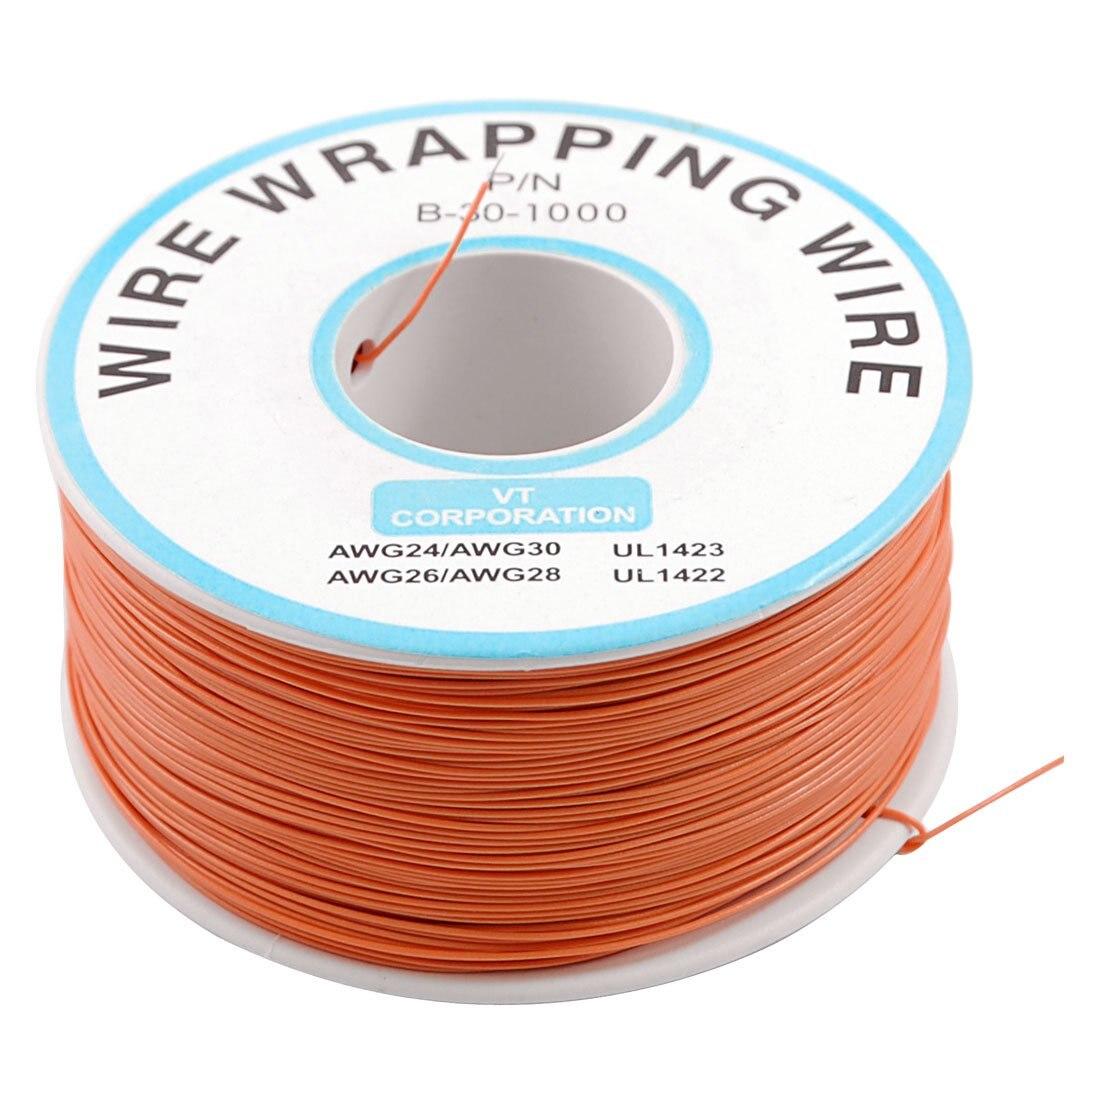 PCB de soldadura naranja Flexible 0,5mm dia exterior 30AWG Envoltura de cable de 1000Ft 6,3 enchufe plano de púas resorte terminal frío cableado enchufe de codo primavera